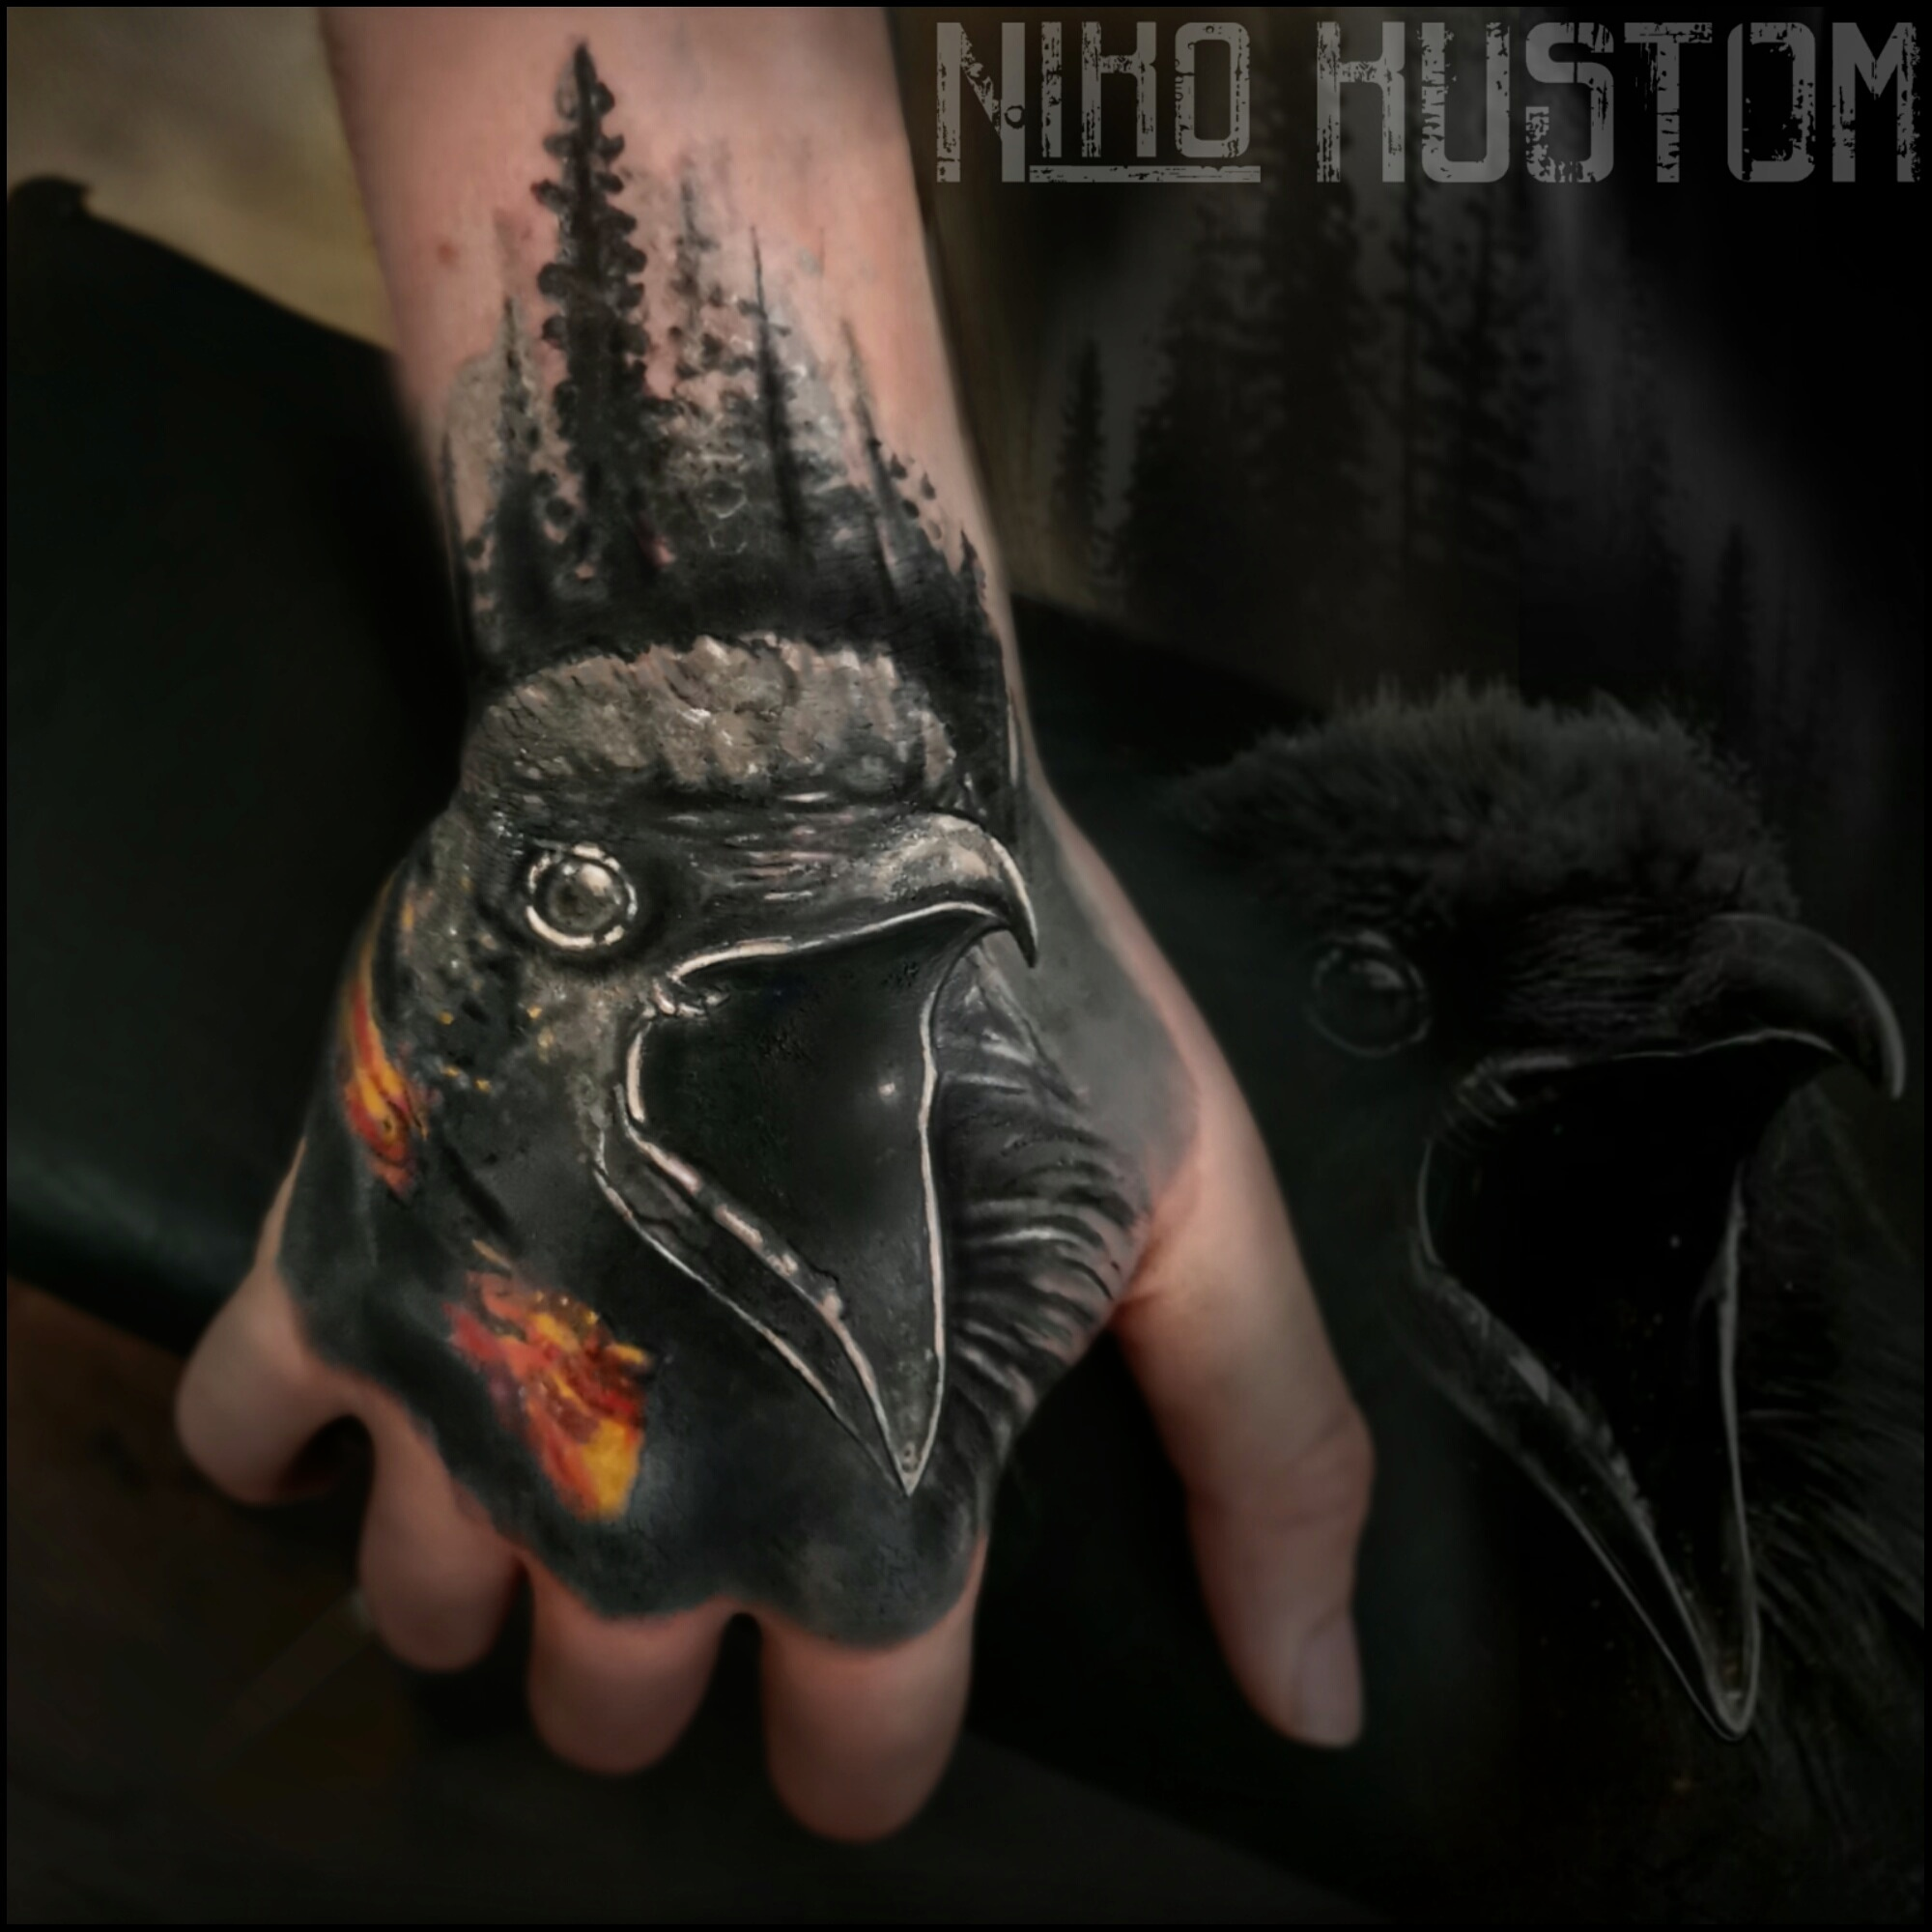 Niko's new tattoos